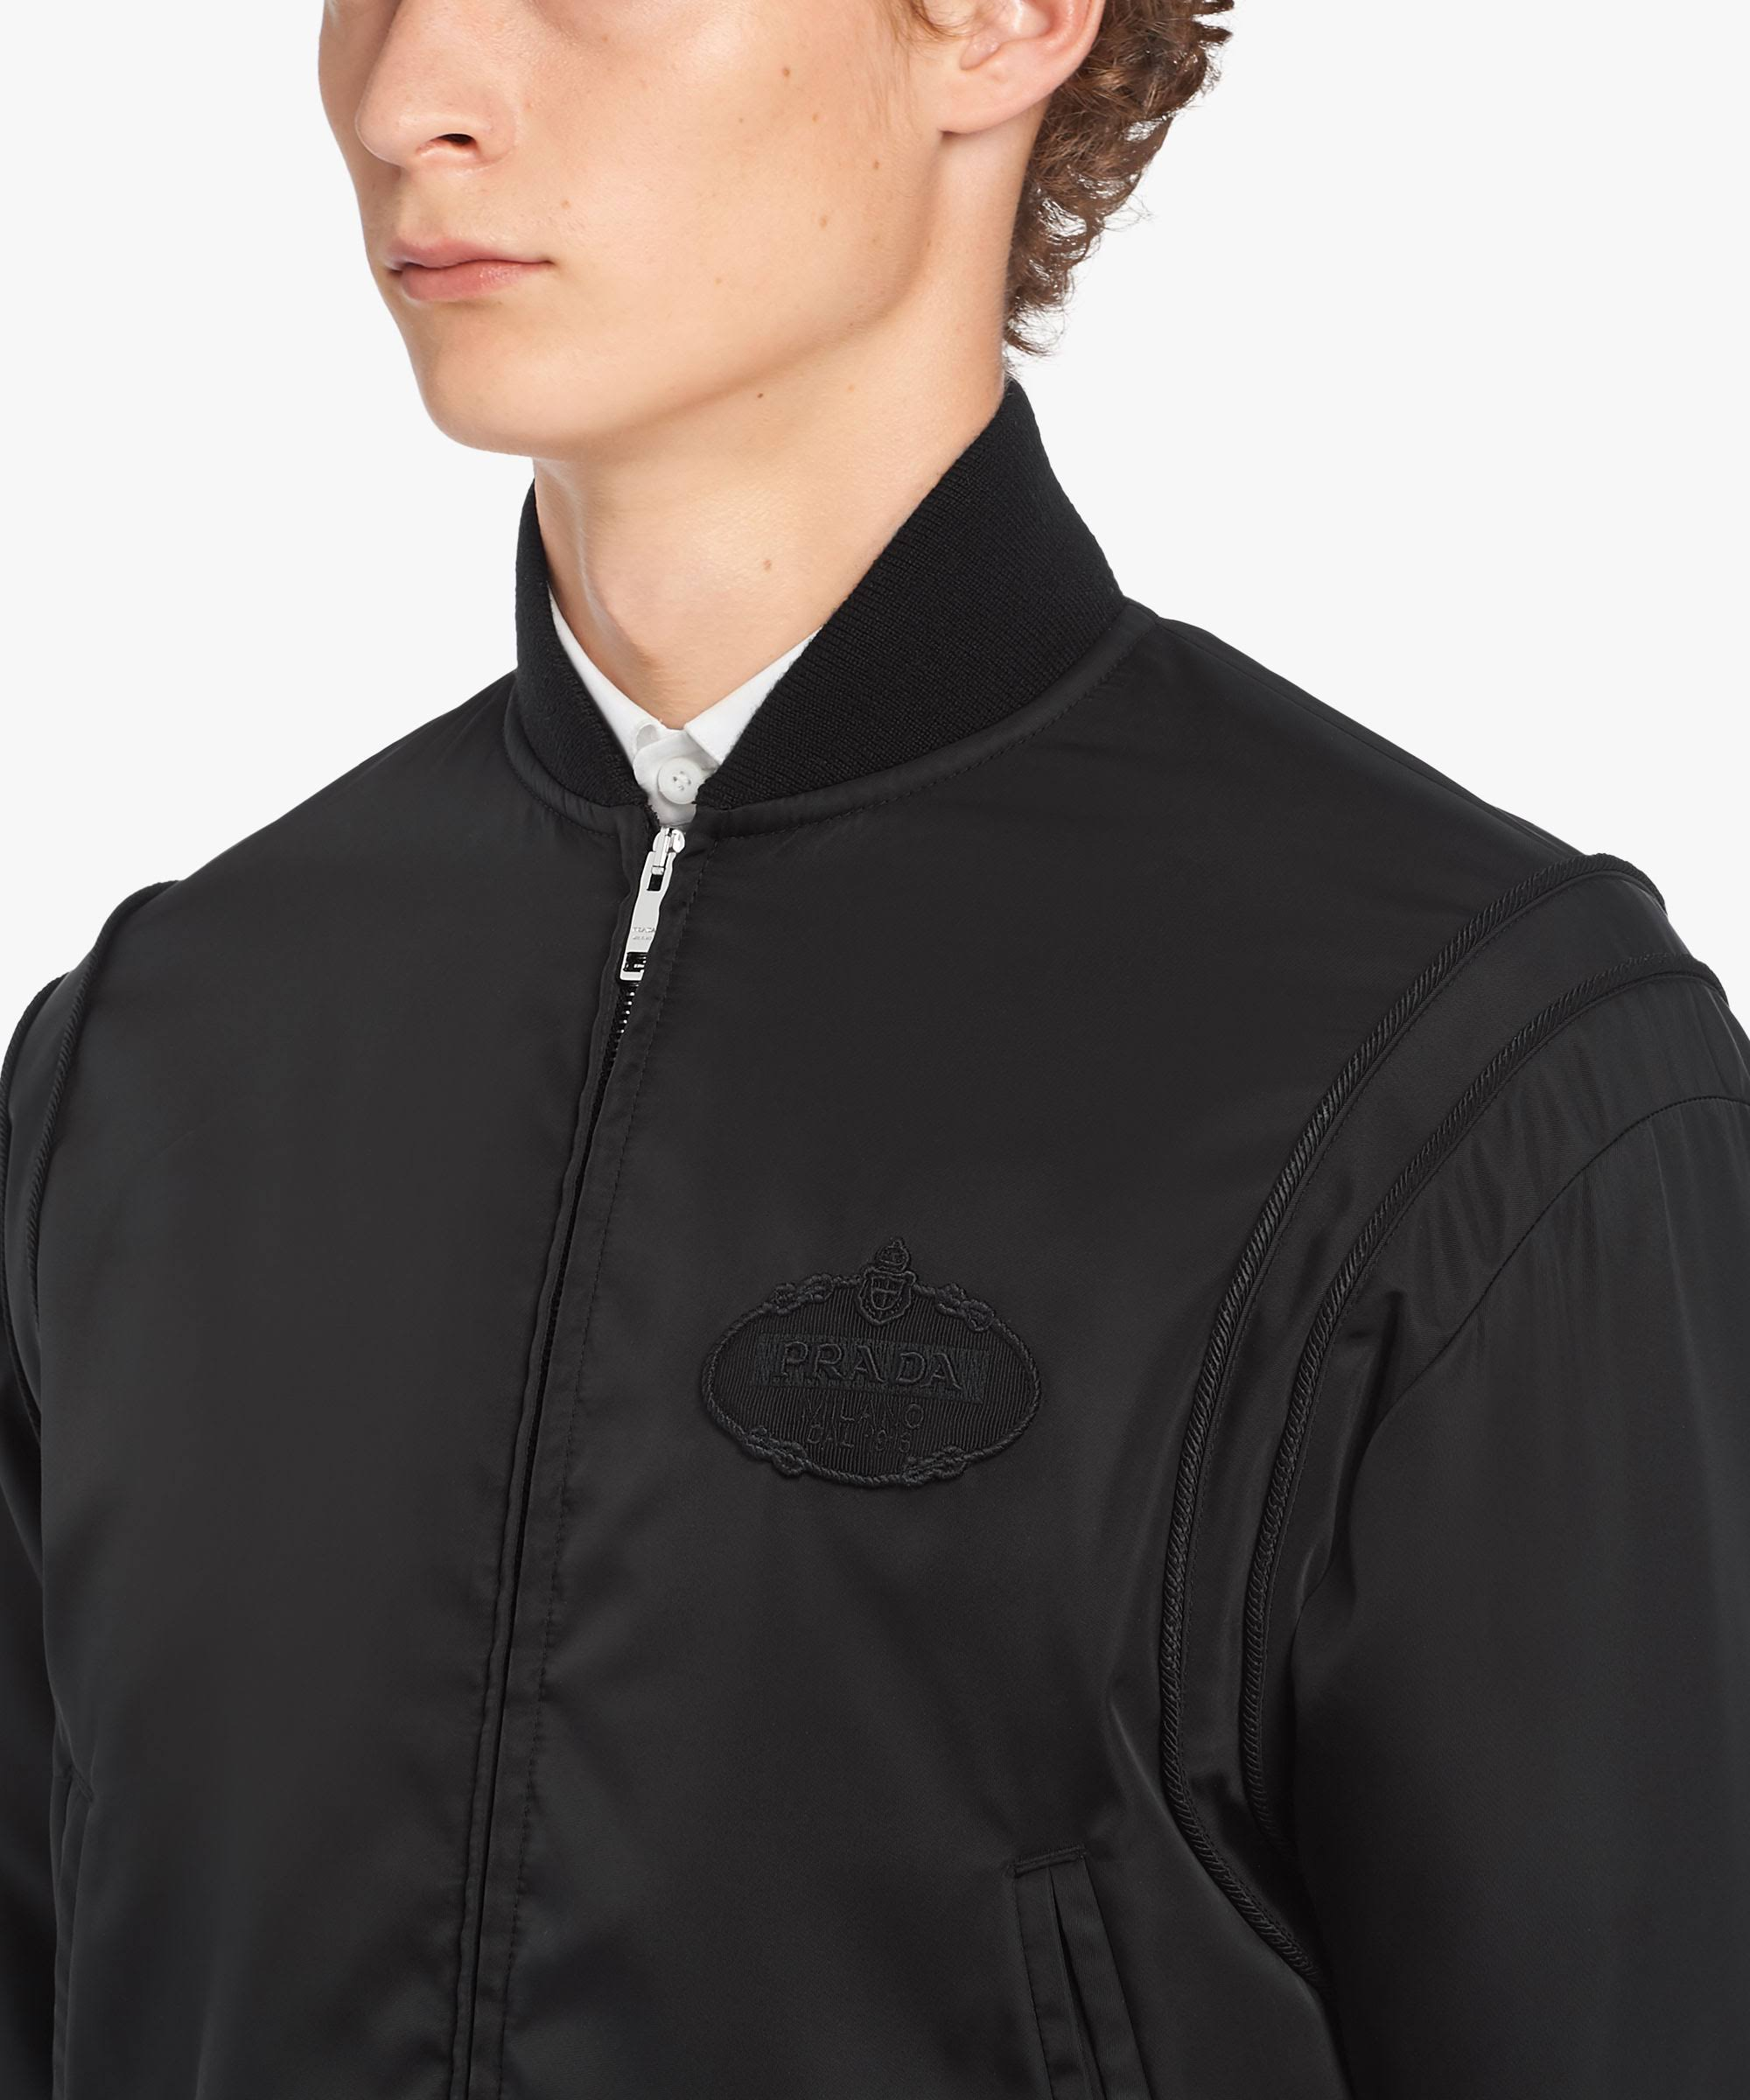 Jacket Bomber Gabardine Gabardine Black Jacket Prada Bomber Prada Black OxwSqzwd